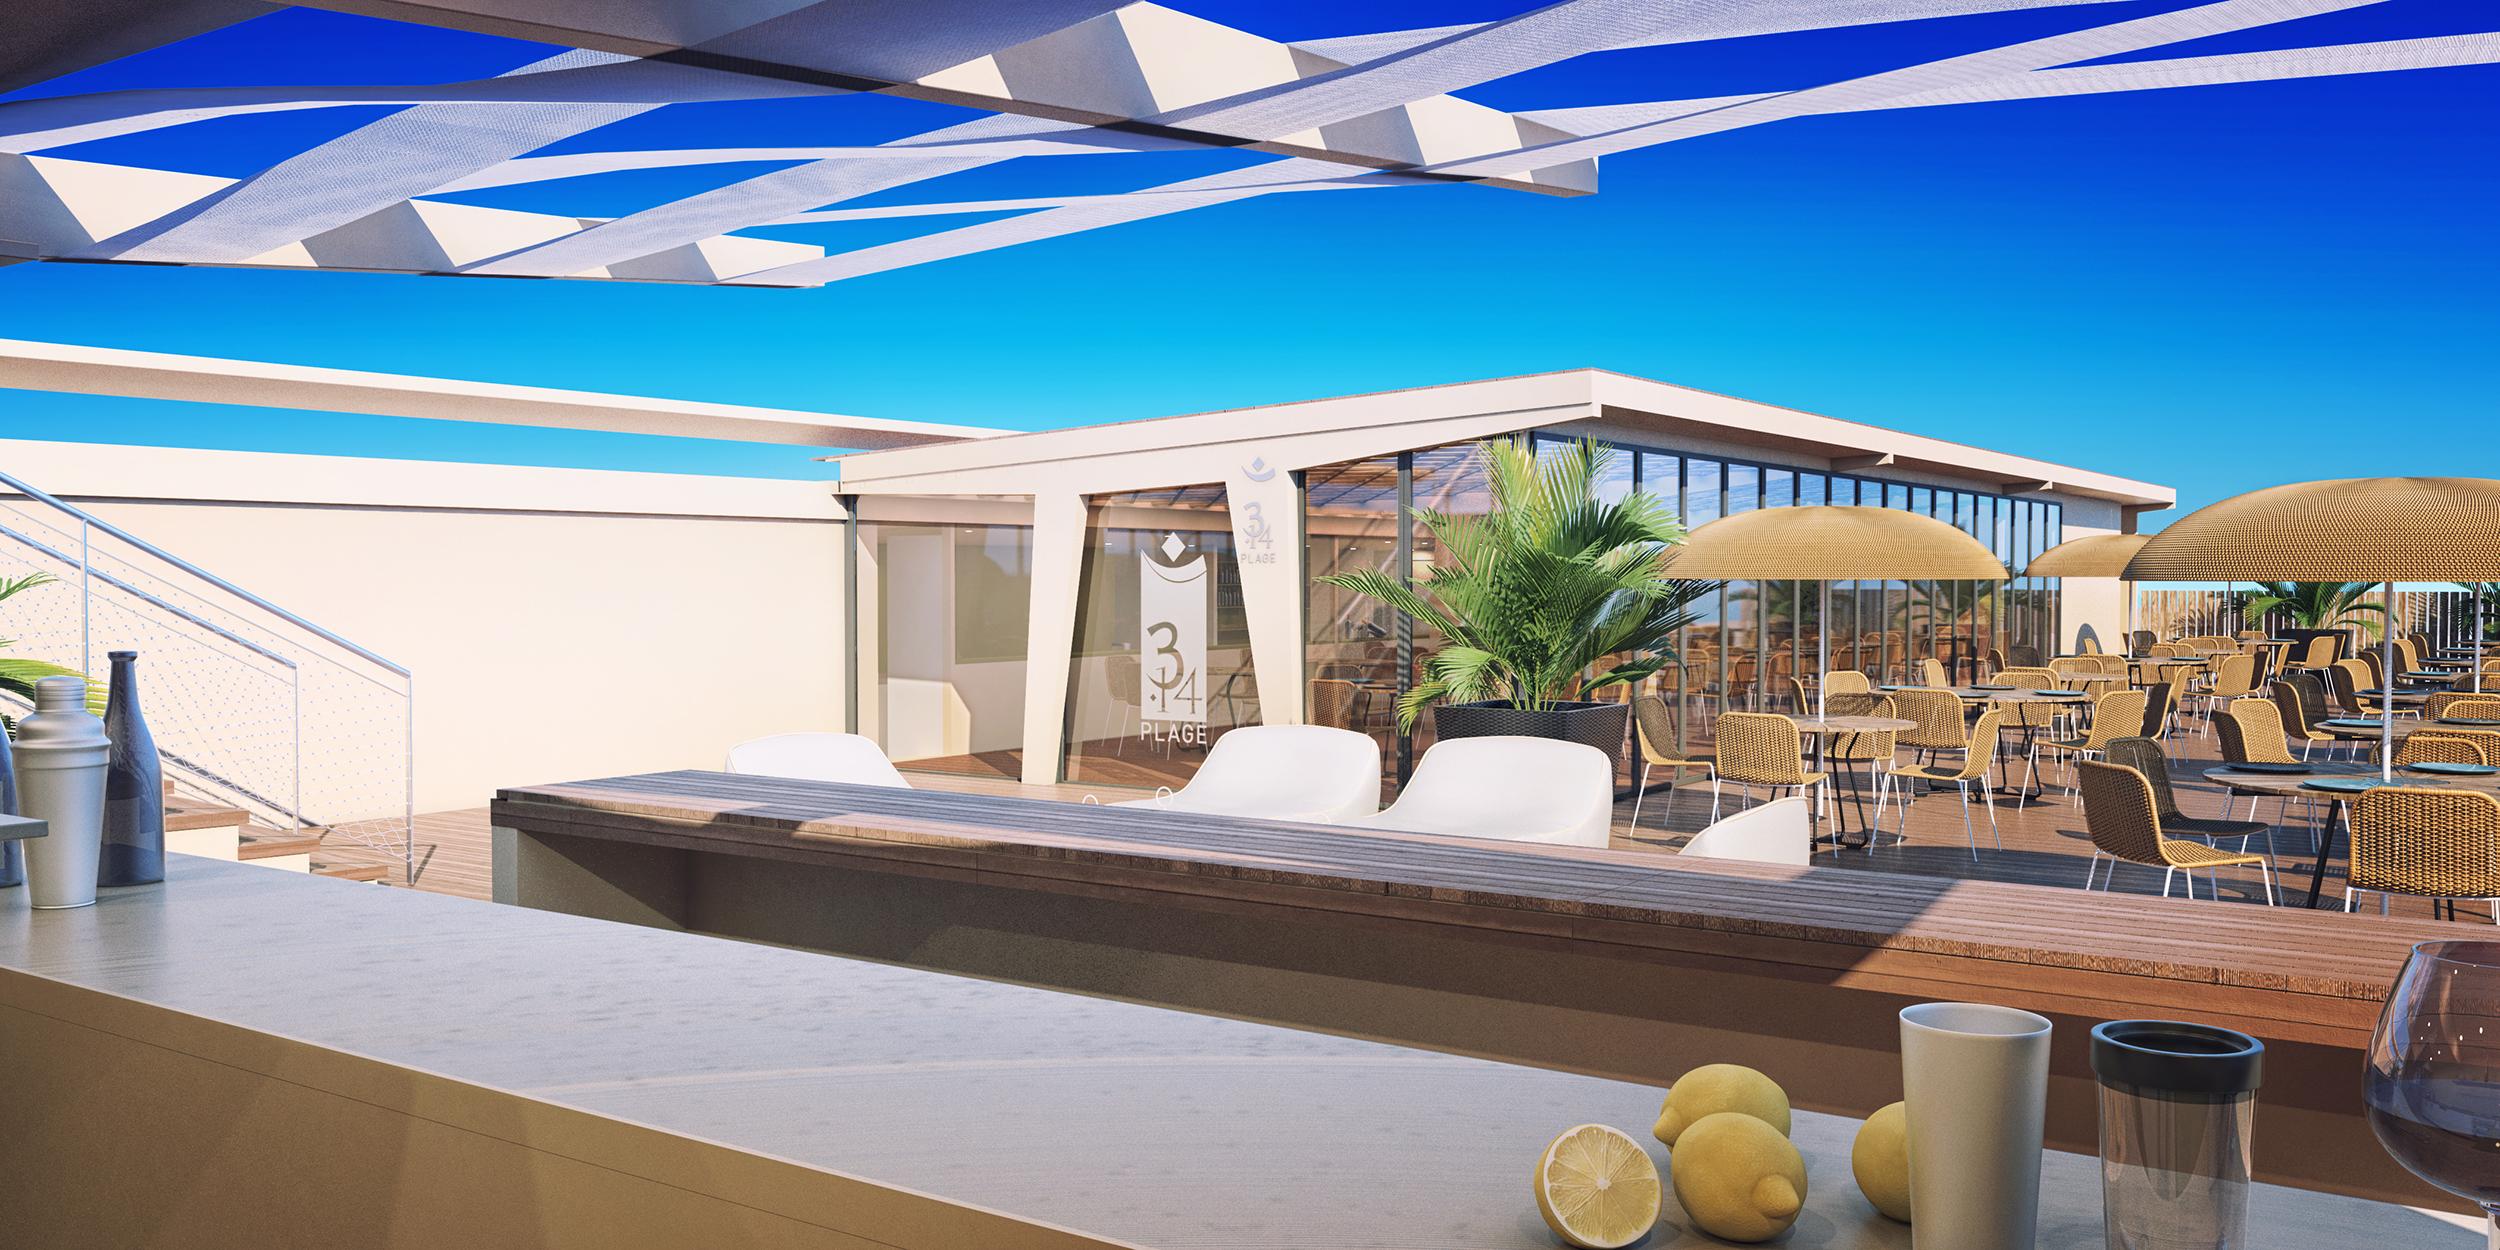 Illustrations 3d casino Cannes - Dripmoon